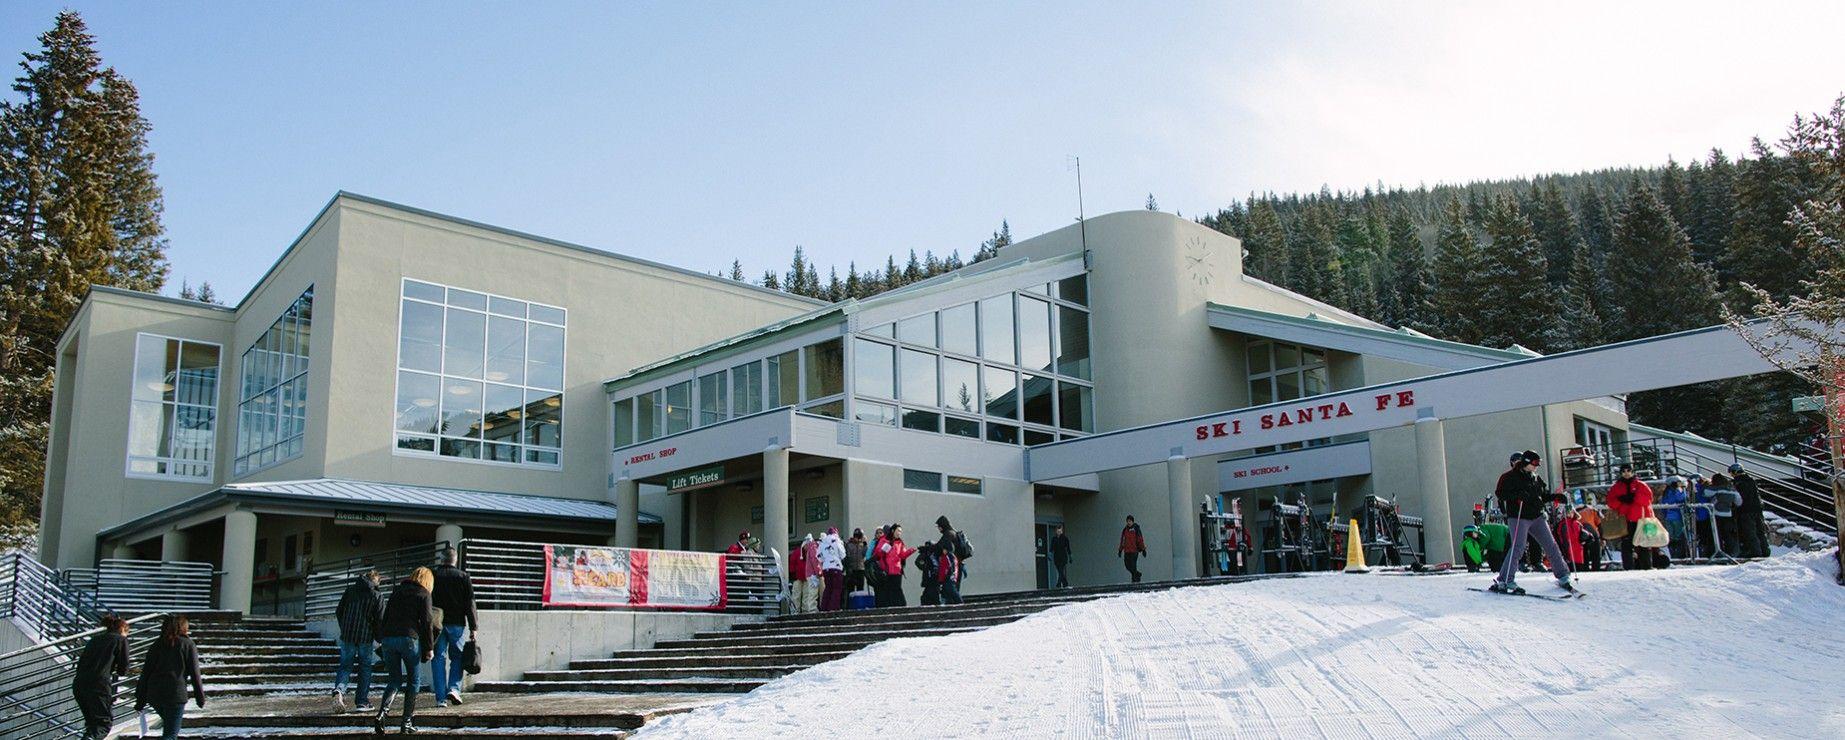 lift tickets | santa fe ski basin | skiing, ski rental, santa fe